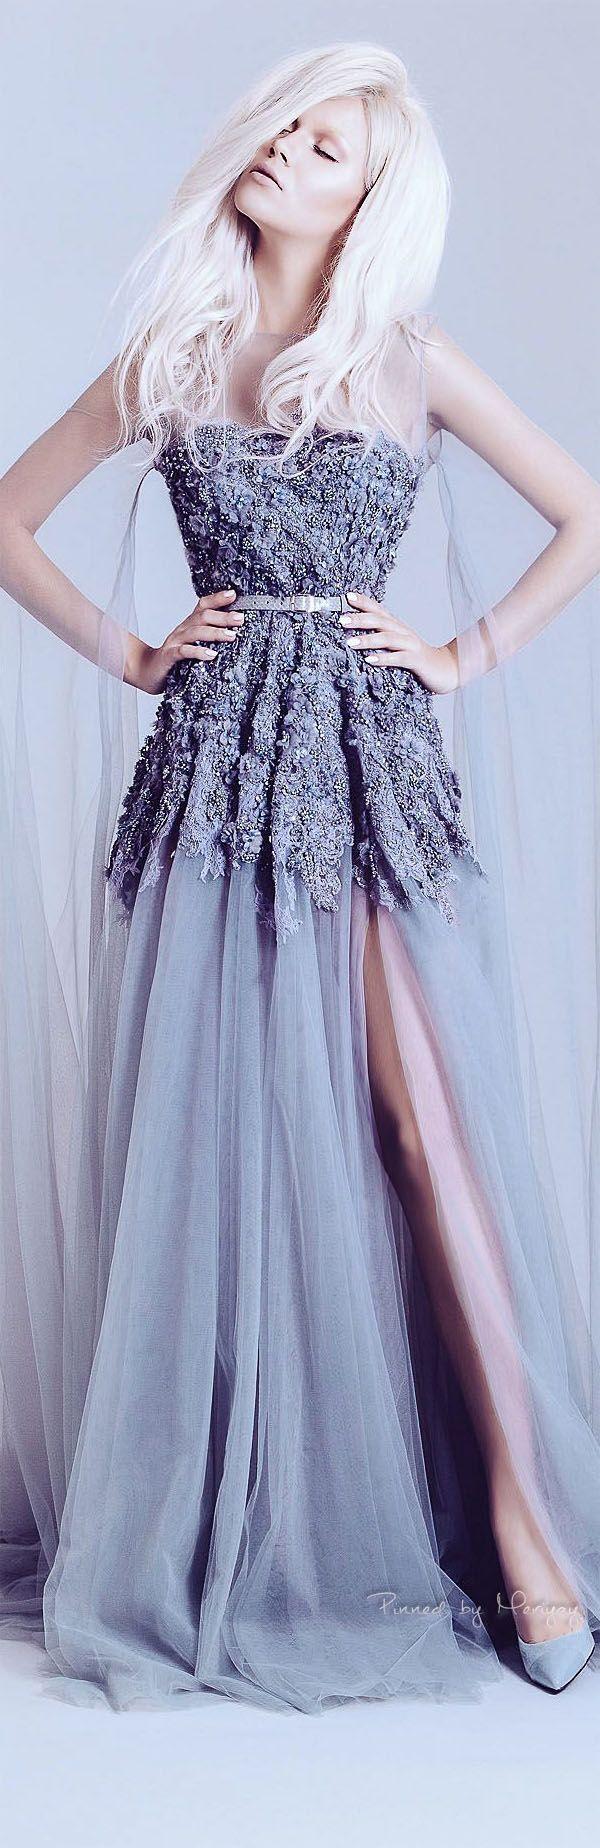 Alfazairy Spring-summer 2015 #evatornadoblog #fashion #style #mycollection #girl #look @evatornado